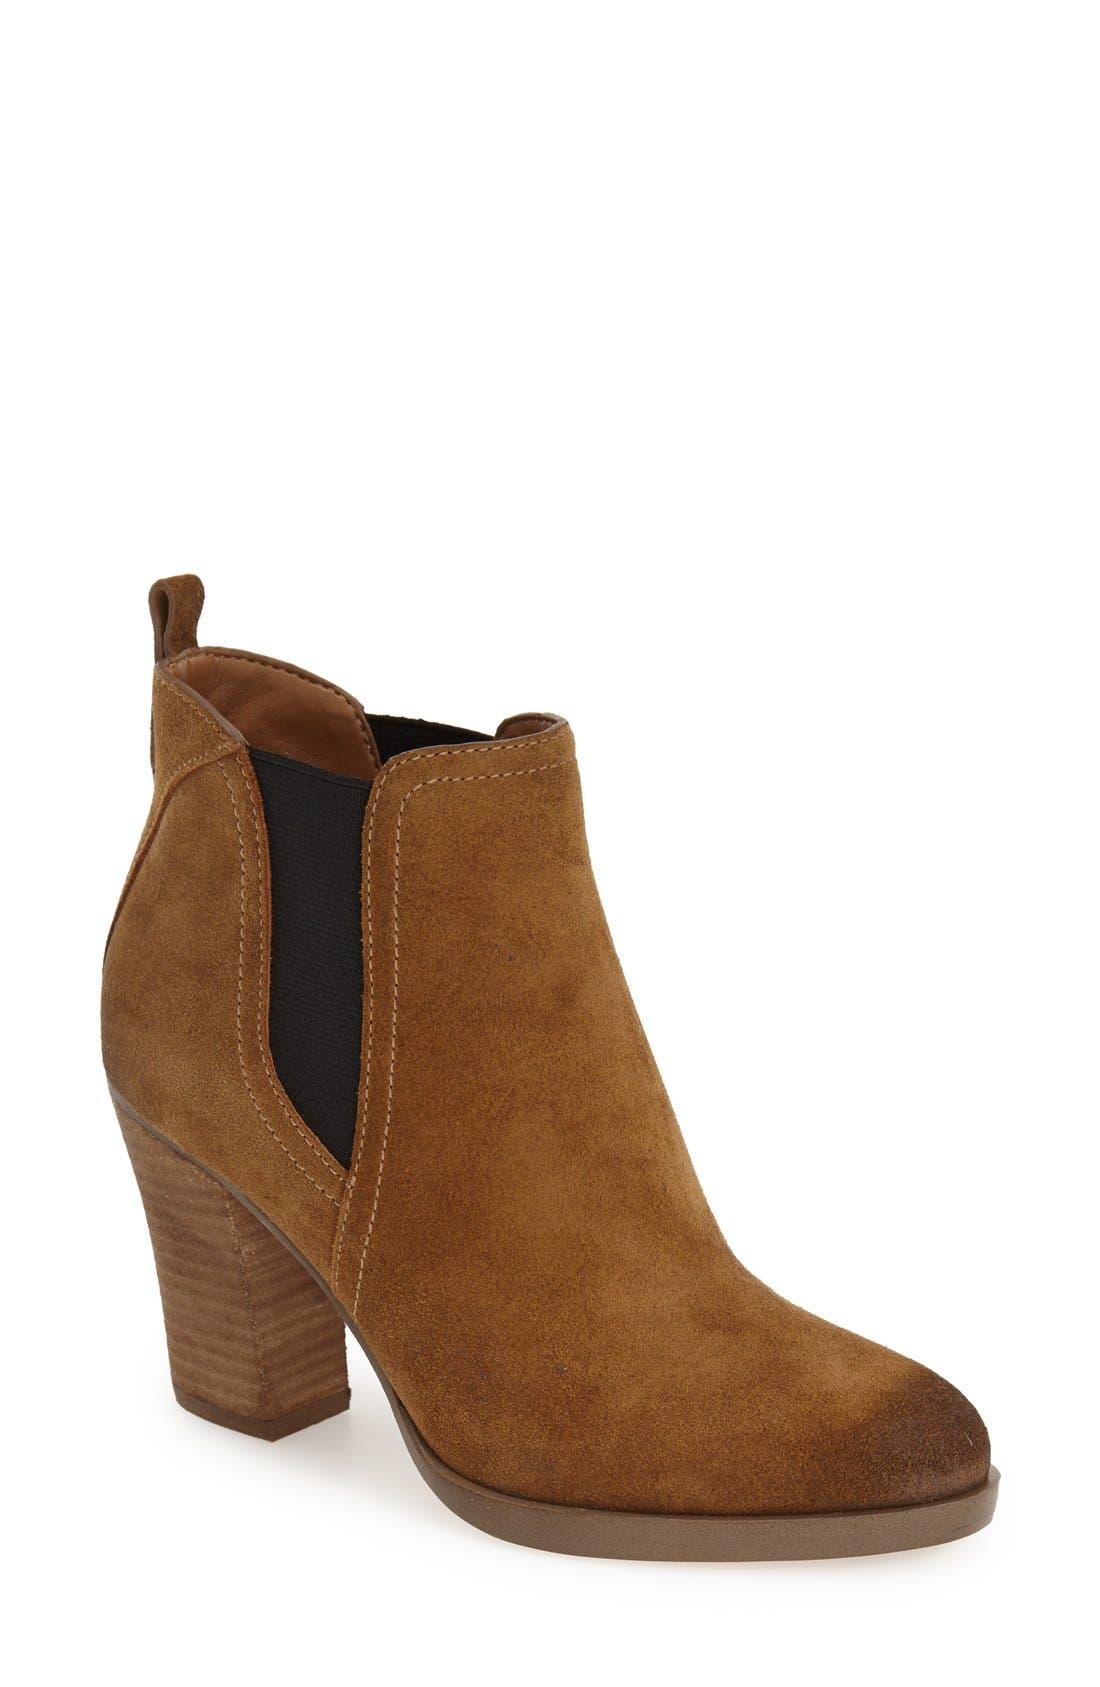 Alternate Image 1 Selected - Marc Fisher LTD 'Mallory' Chelsea Boot (Women)